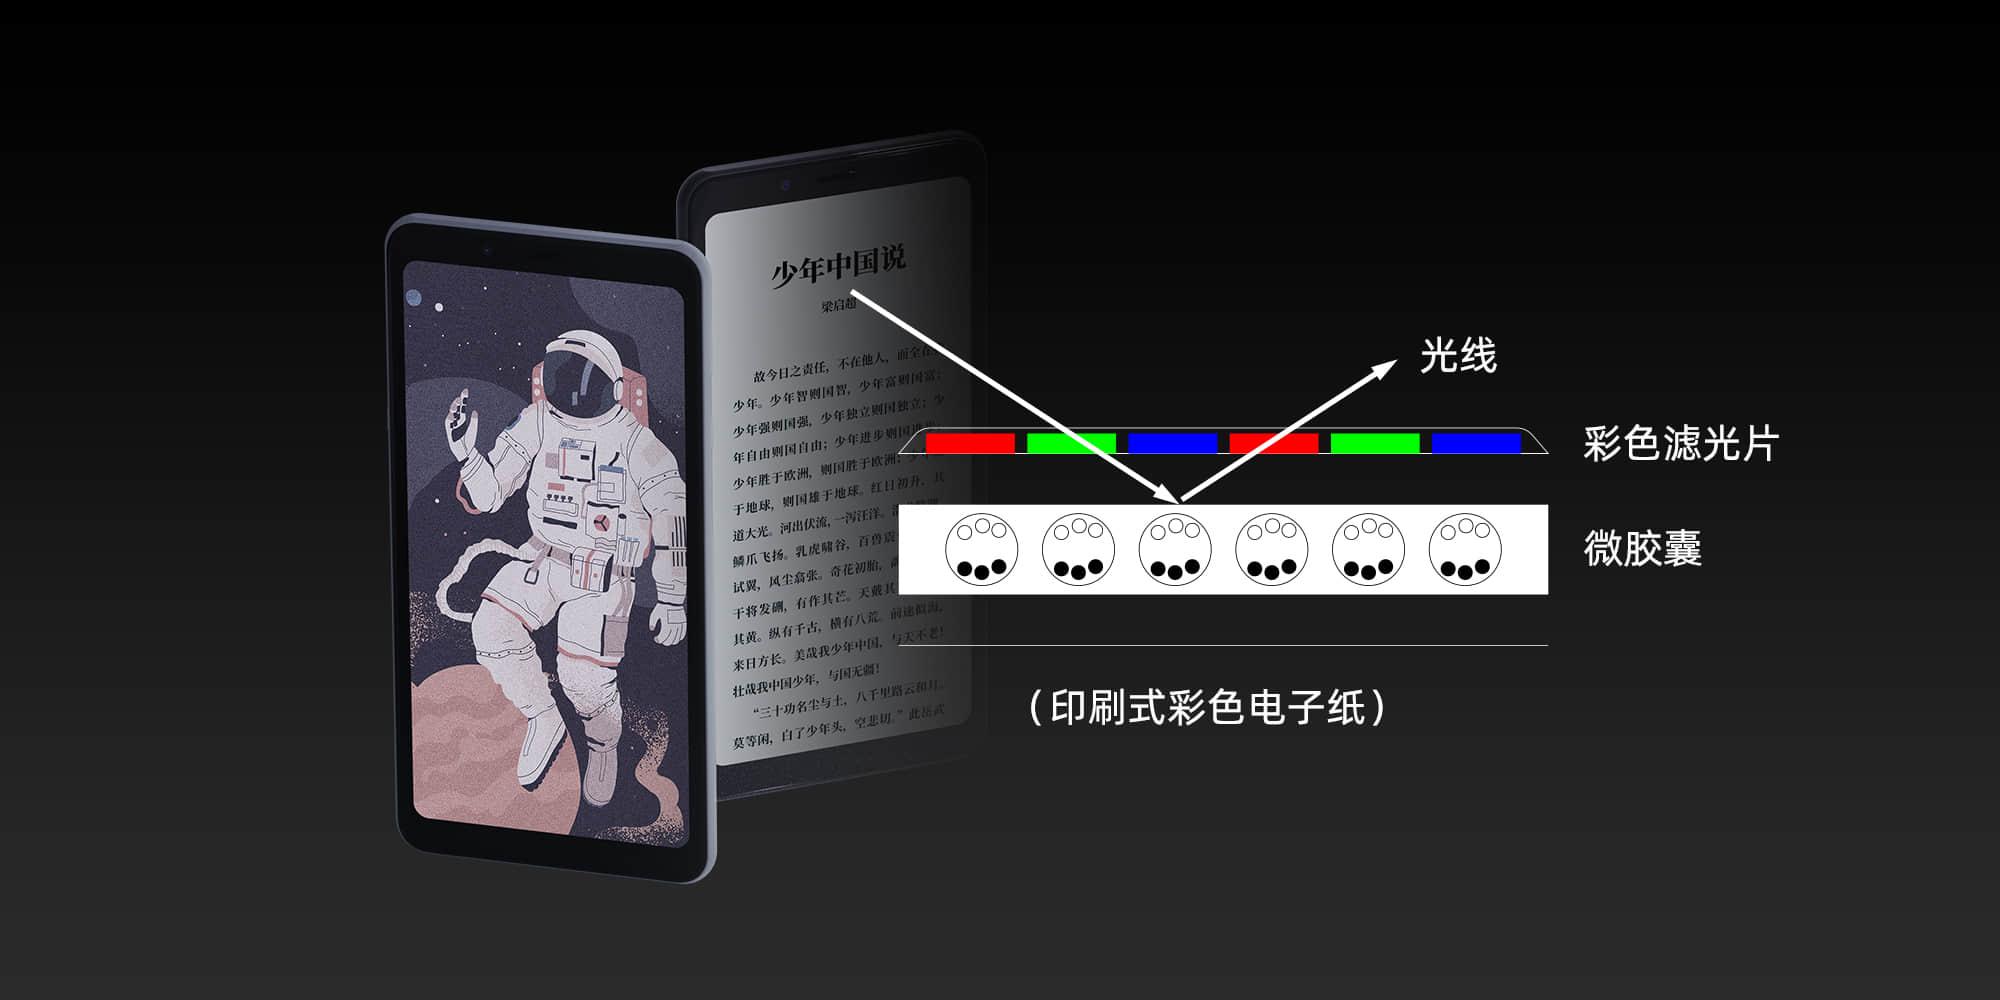 C:\Users\guojinhua1\Desktop\A5C发布会ppt\12.jpg12